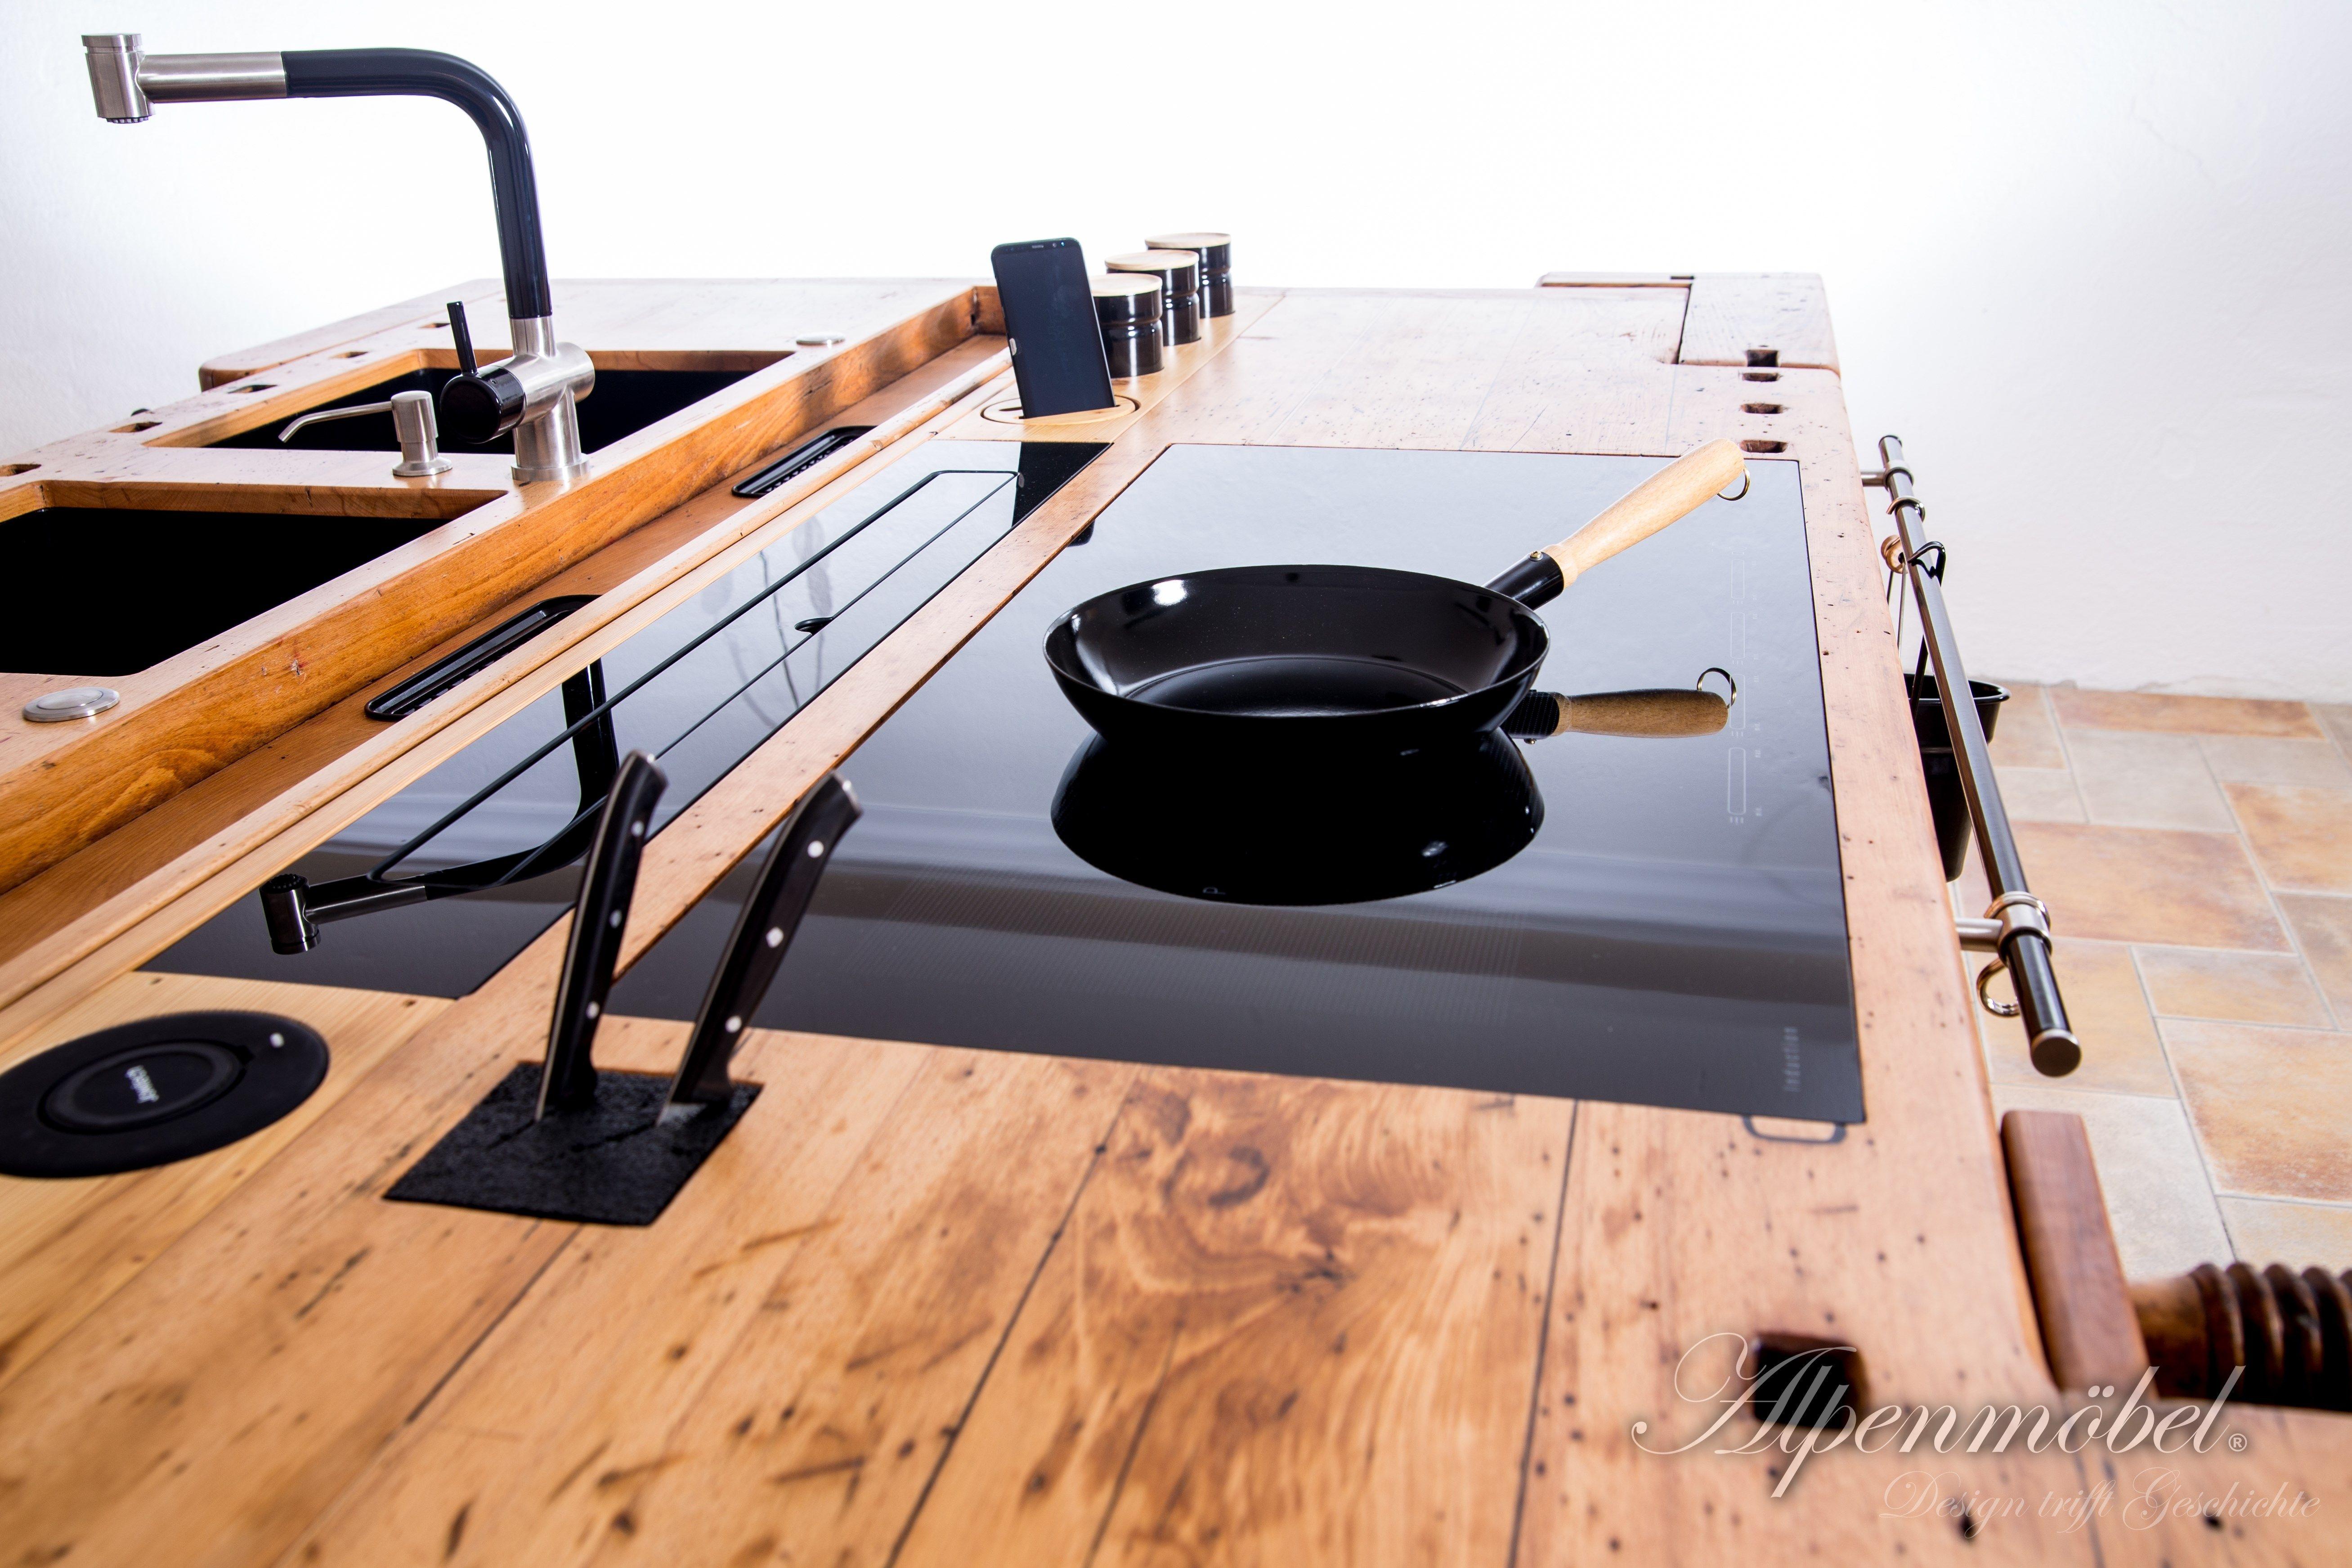 Alpenmobel Design Trifft Geschichte Alpenmobel Produktsortiment Altholz Arbeitsplatte Mobel Holz Holzarbeitsplatte